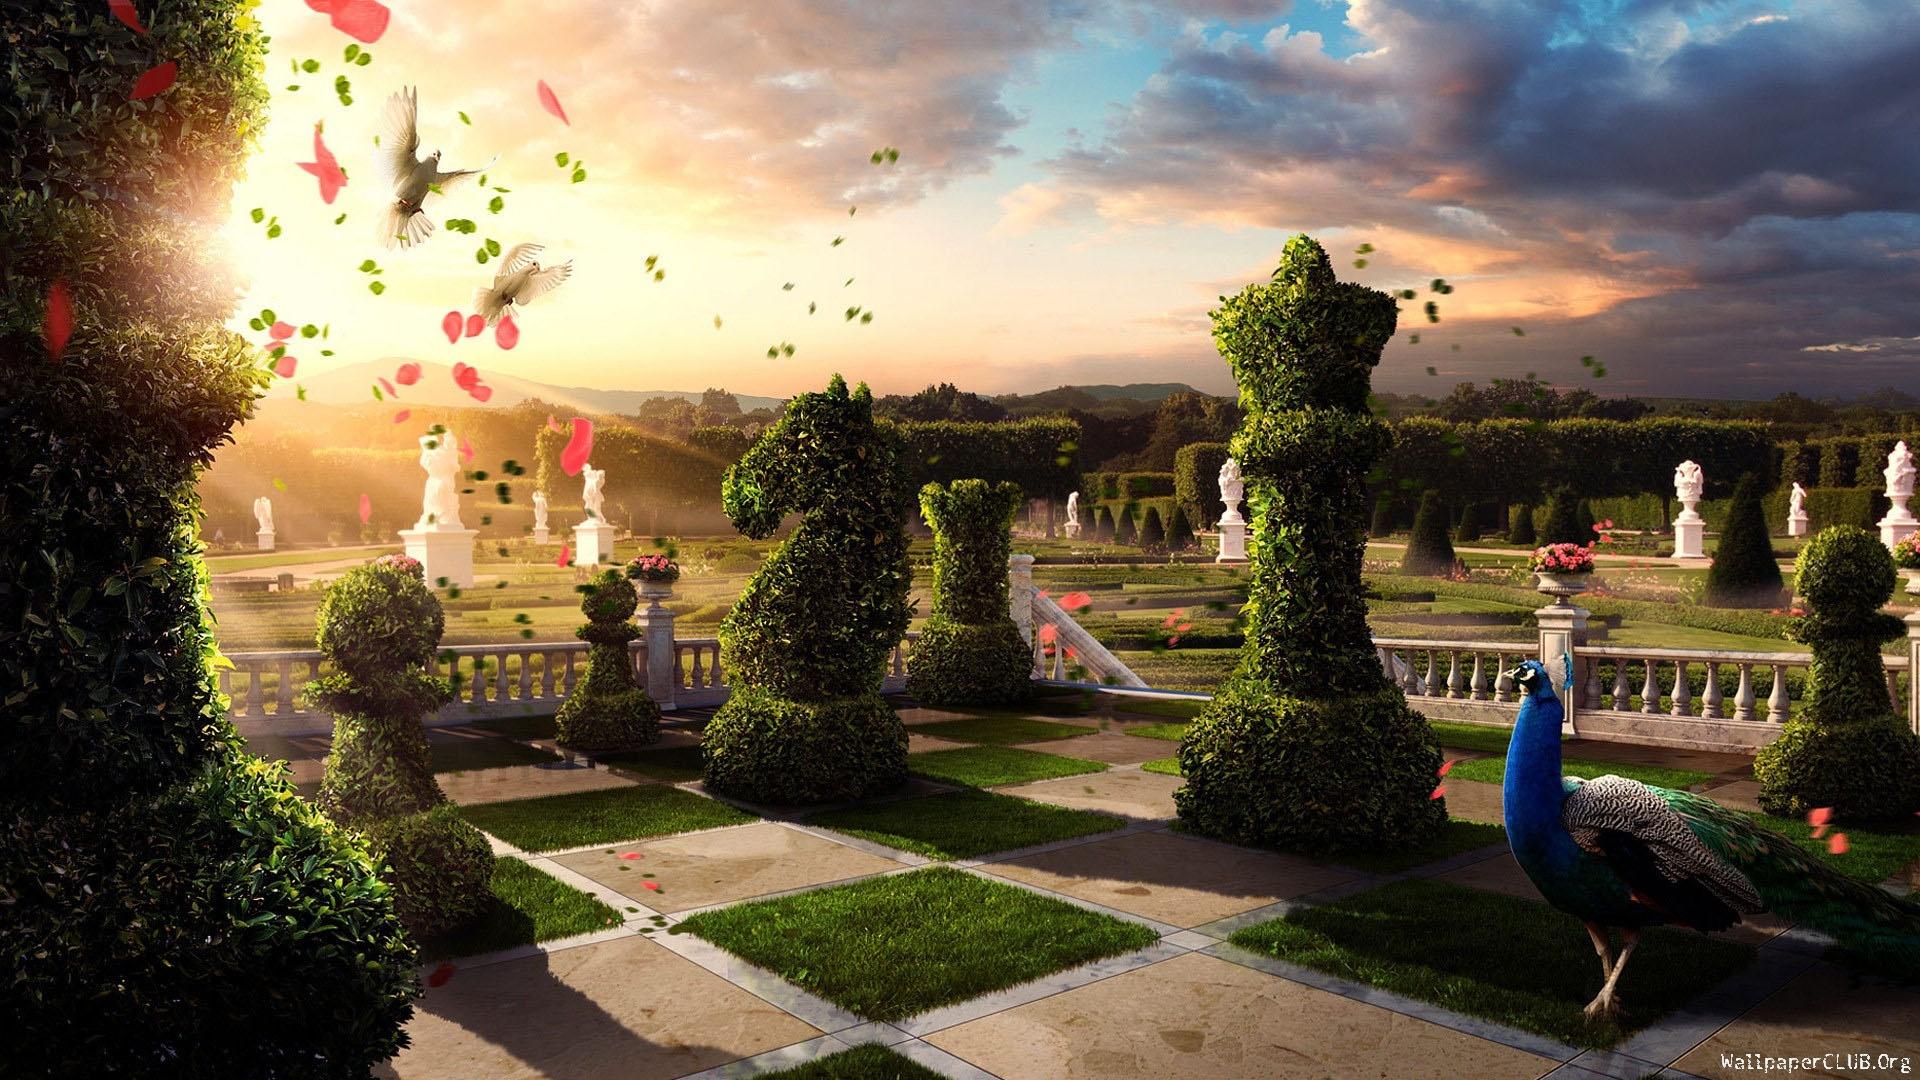 Sunlight Garden Chess Palace Estate Flower Mansion 1920x1080 Px Courtyard